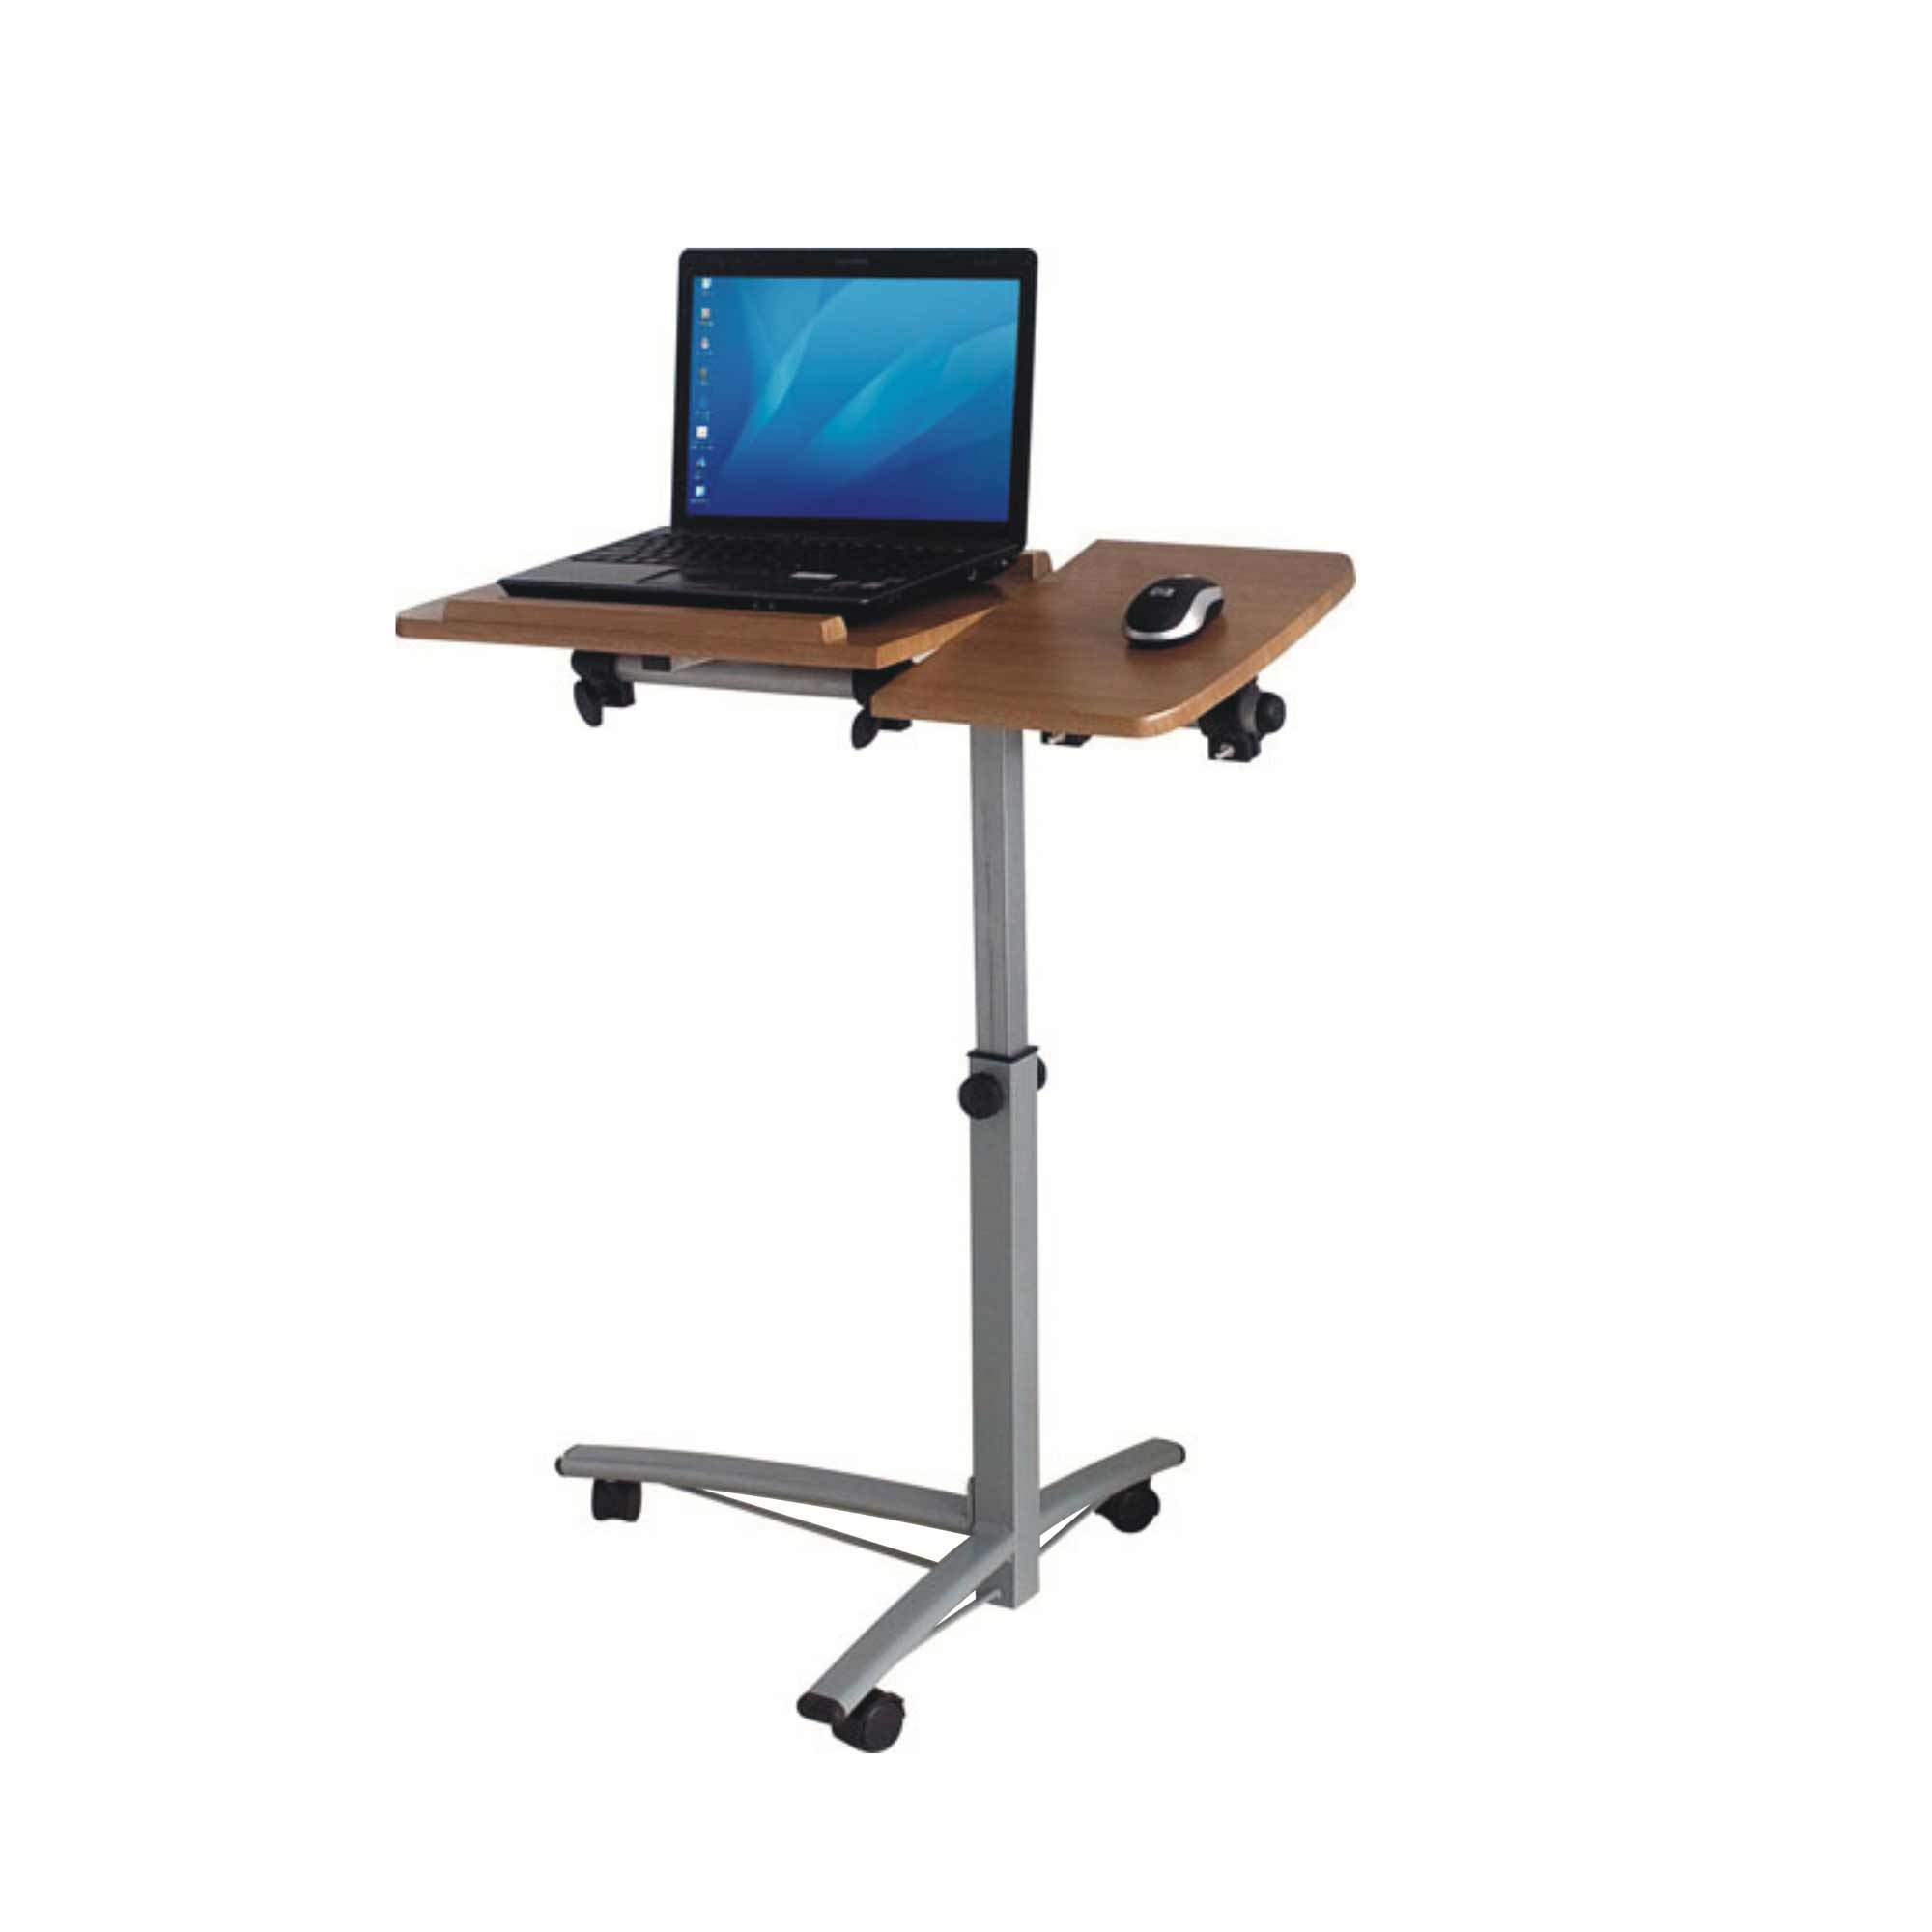 Folding Laptop Desk Benefits